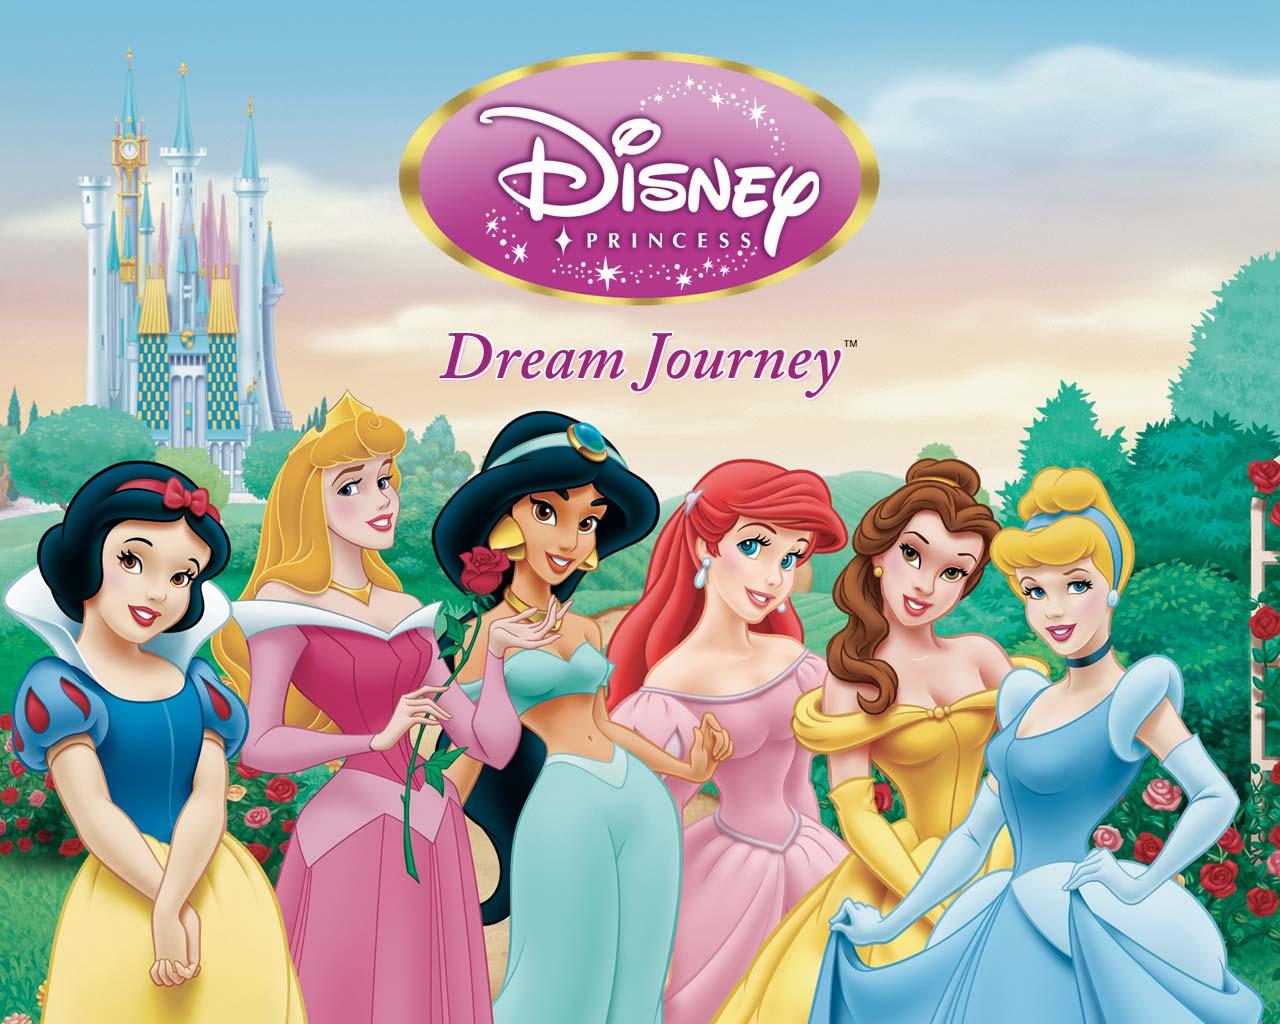 http://4.bp.blogspot.com/-57WNFIdzHCM/TwAE3bh5CXI/AAAAAAAADVk/4Hy46ewLo0c/s1600/Disney+Princess+Wallpaper+006.jpg